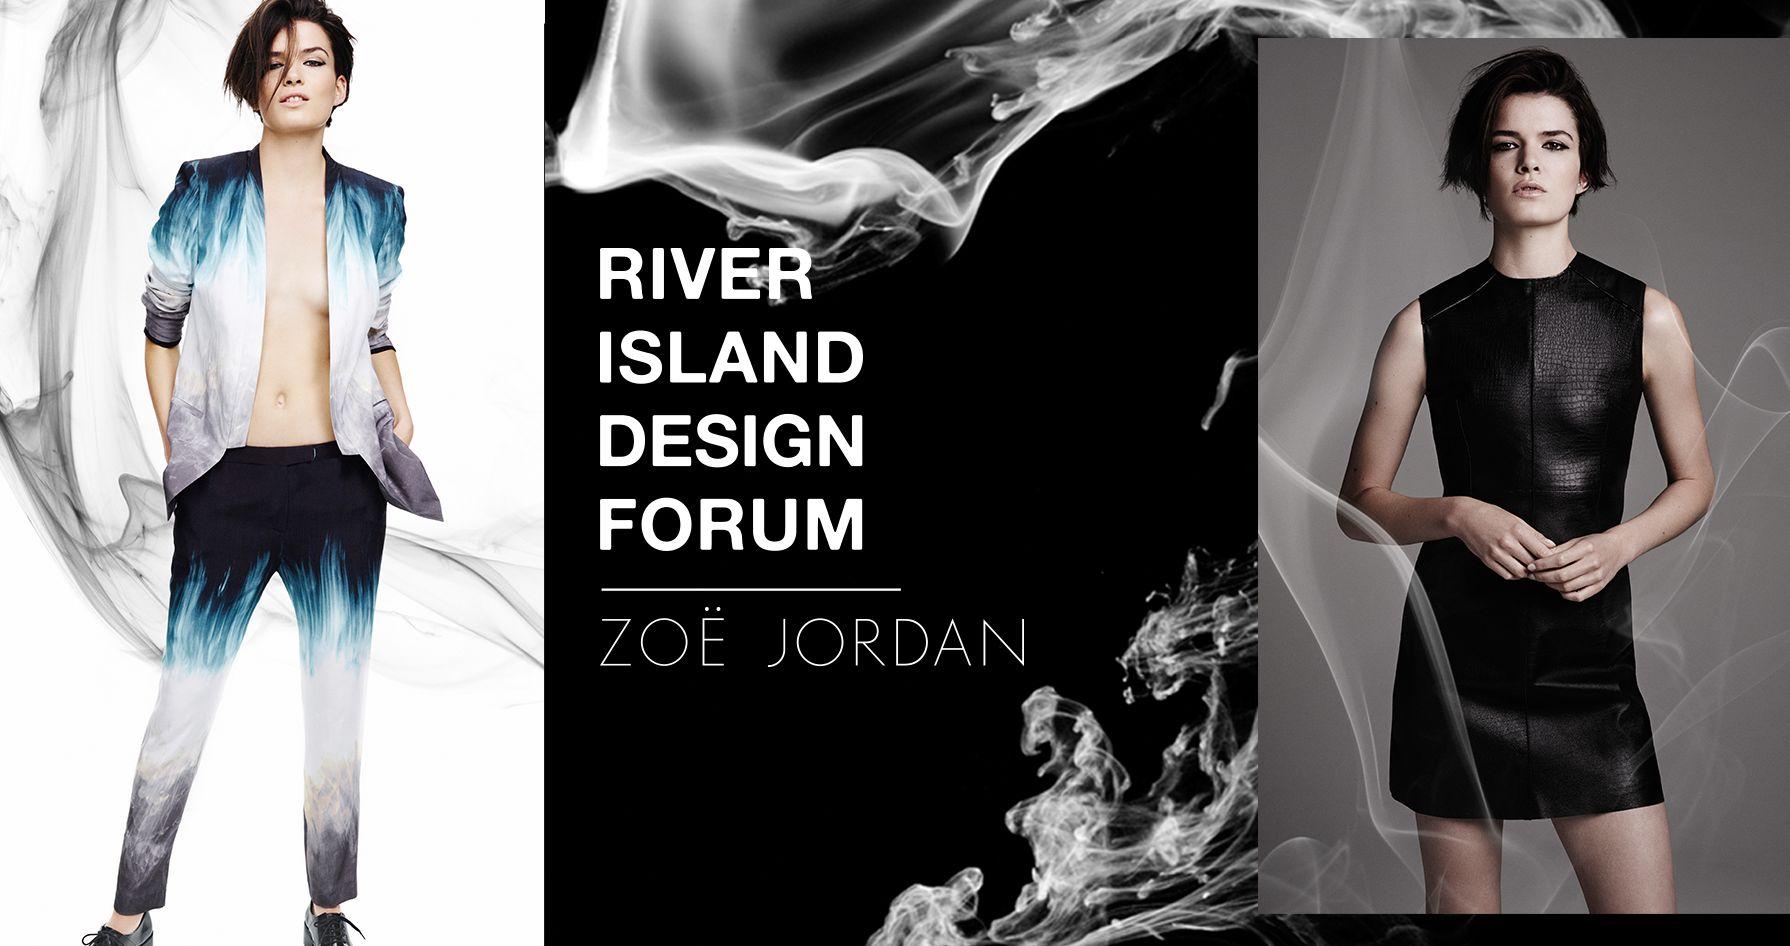 ZOE JORDAN FOR RIVER ISLAND DESIGN FORUM